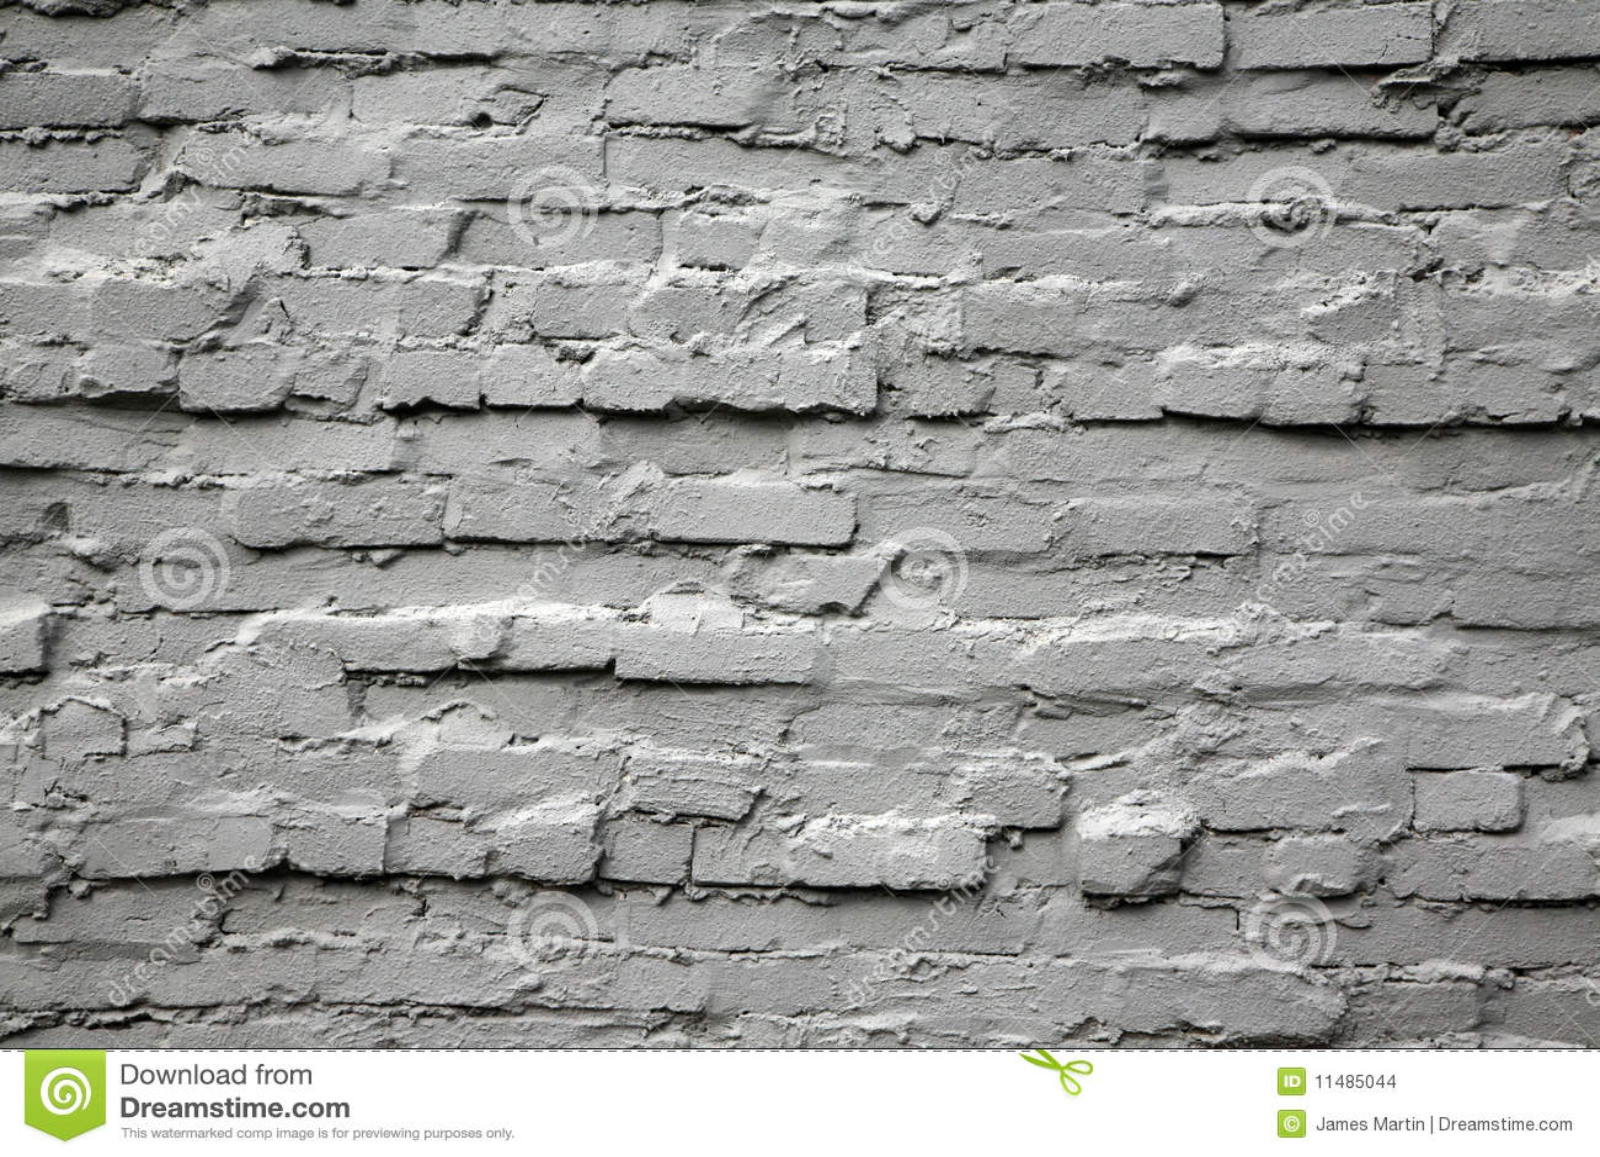 Old Gray Brick Wall Stock Photo Image Of Brickwork Rock